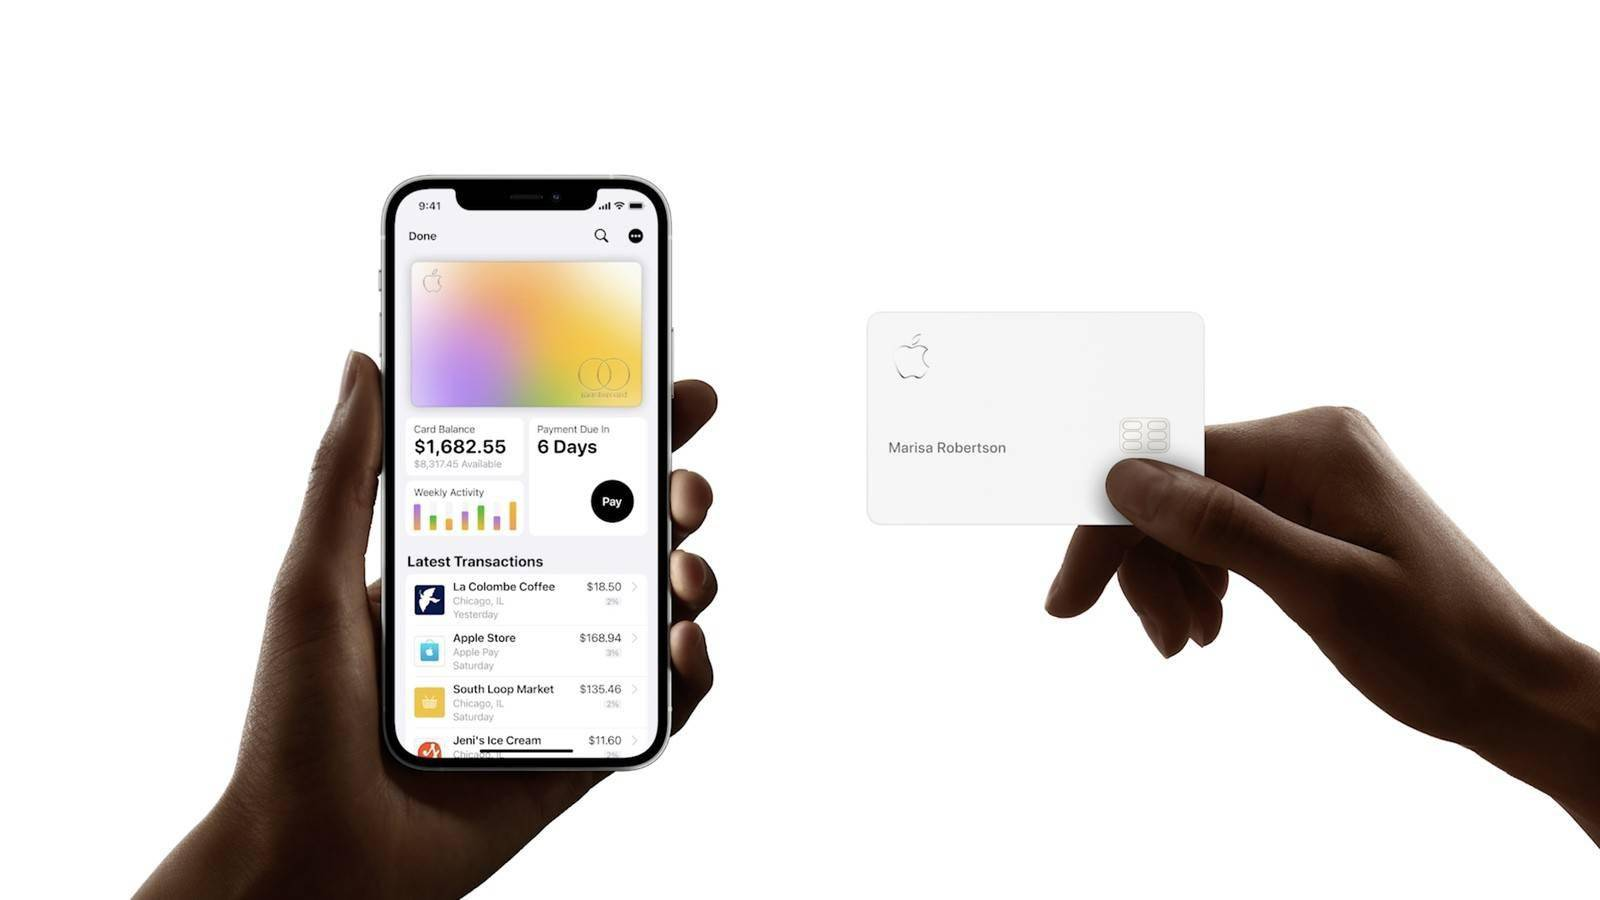 Apple Card服务更新:两口子可共享额度